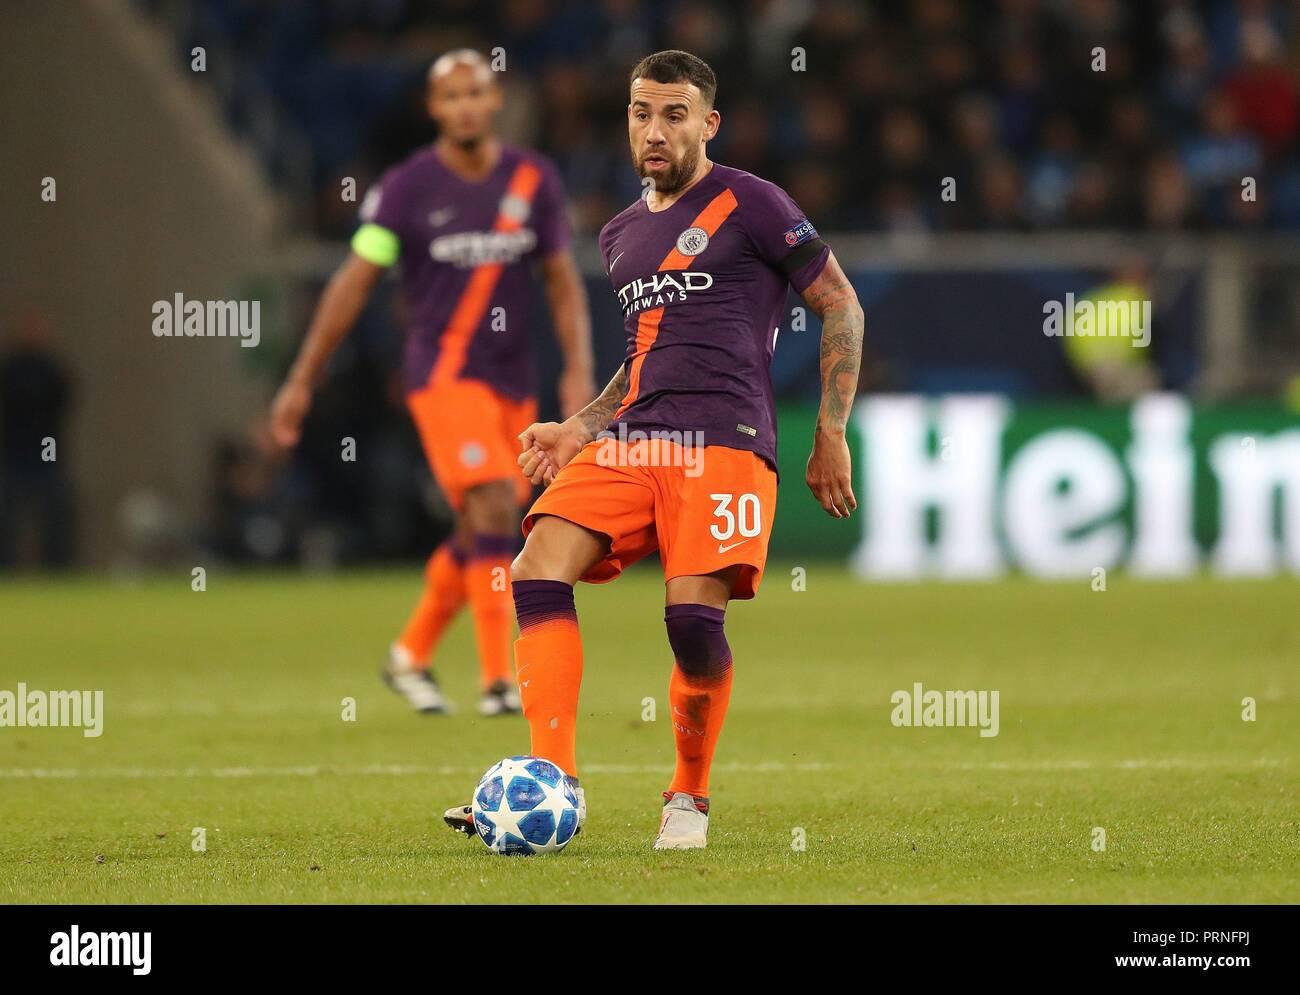 firo: 02.10.2018 Football, Football, Champions League: TSG Hoffenheim - Manchester City 1: 2 single action, Nicolás Otamendi   usage worldwide - Stock Image